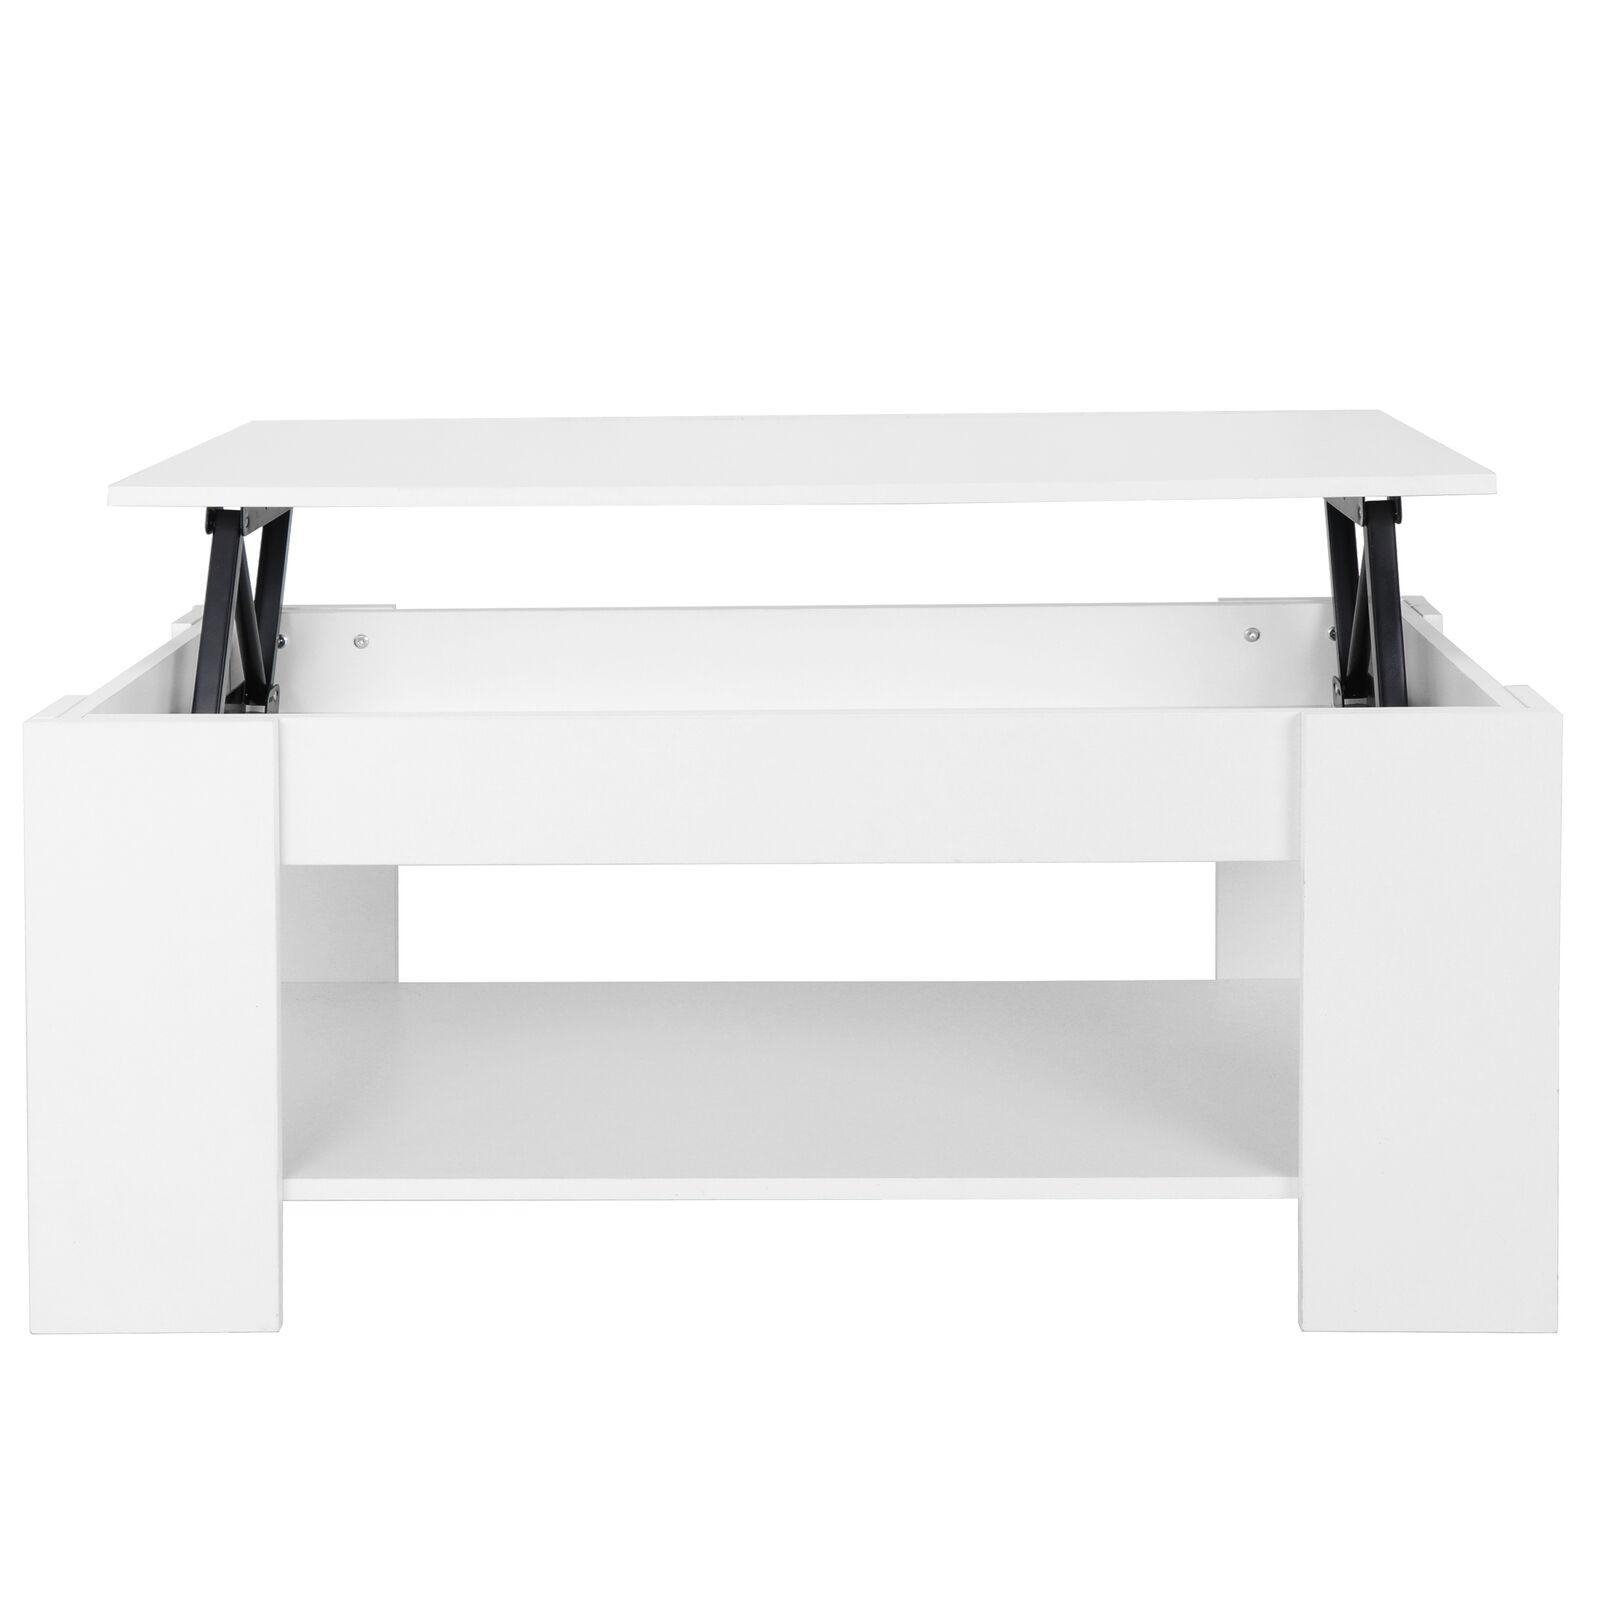 Picture of: Boconcept Chiva Modern Pop Up Hidden Storage Coffee Table For Sale Online Ebay